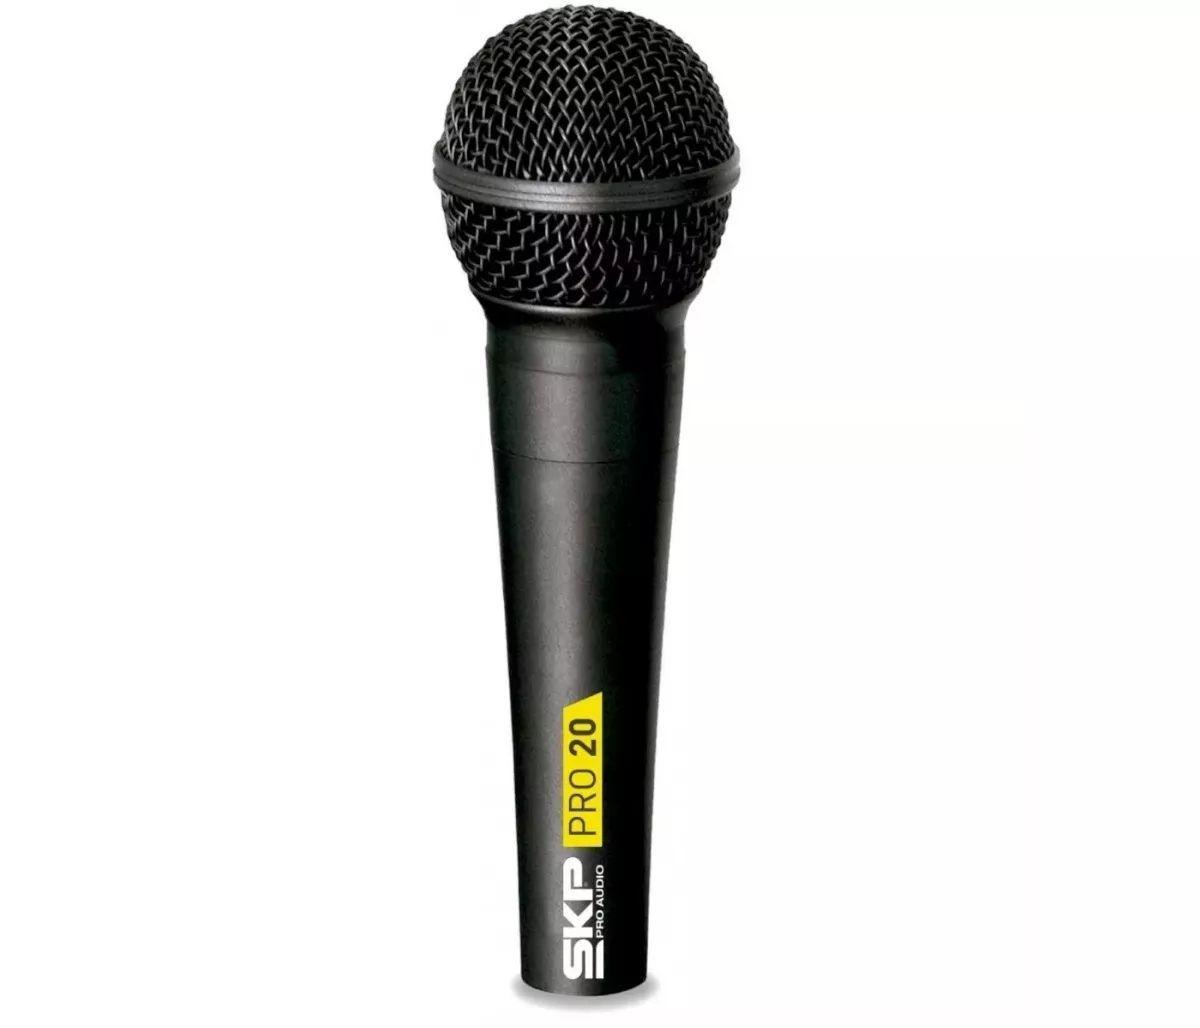 Microfone Com Fio Cardióide Dinâmico Skp Audio Modelo Pro 20 Profissional Xlr